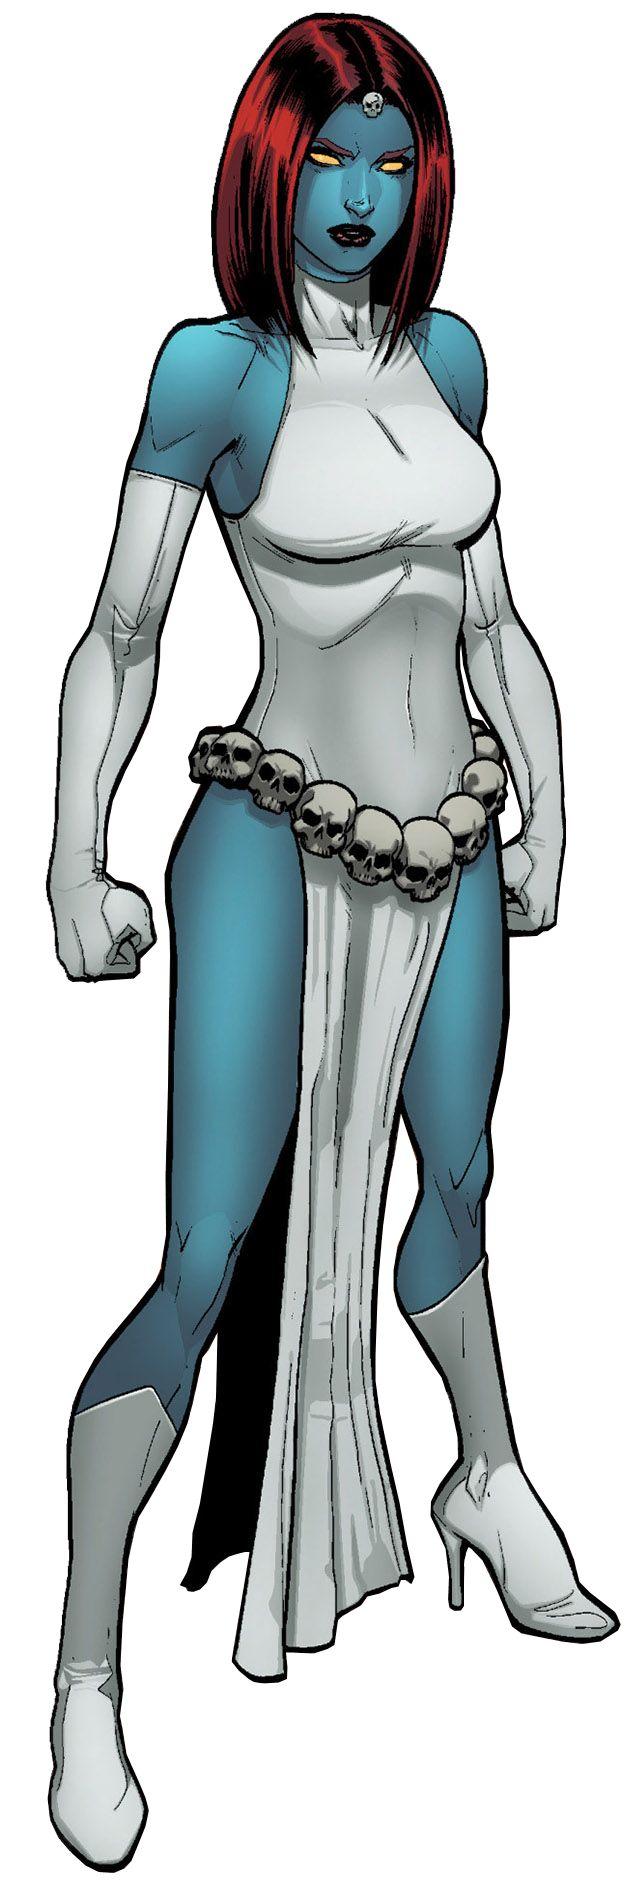 Raven Darkholme (Earth-616) from All-New X-Men Vol 1 7 001